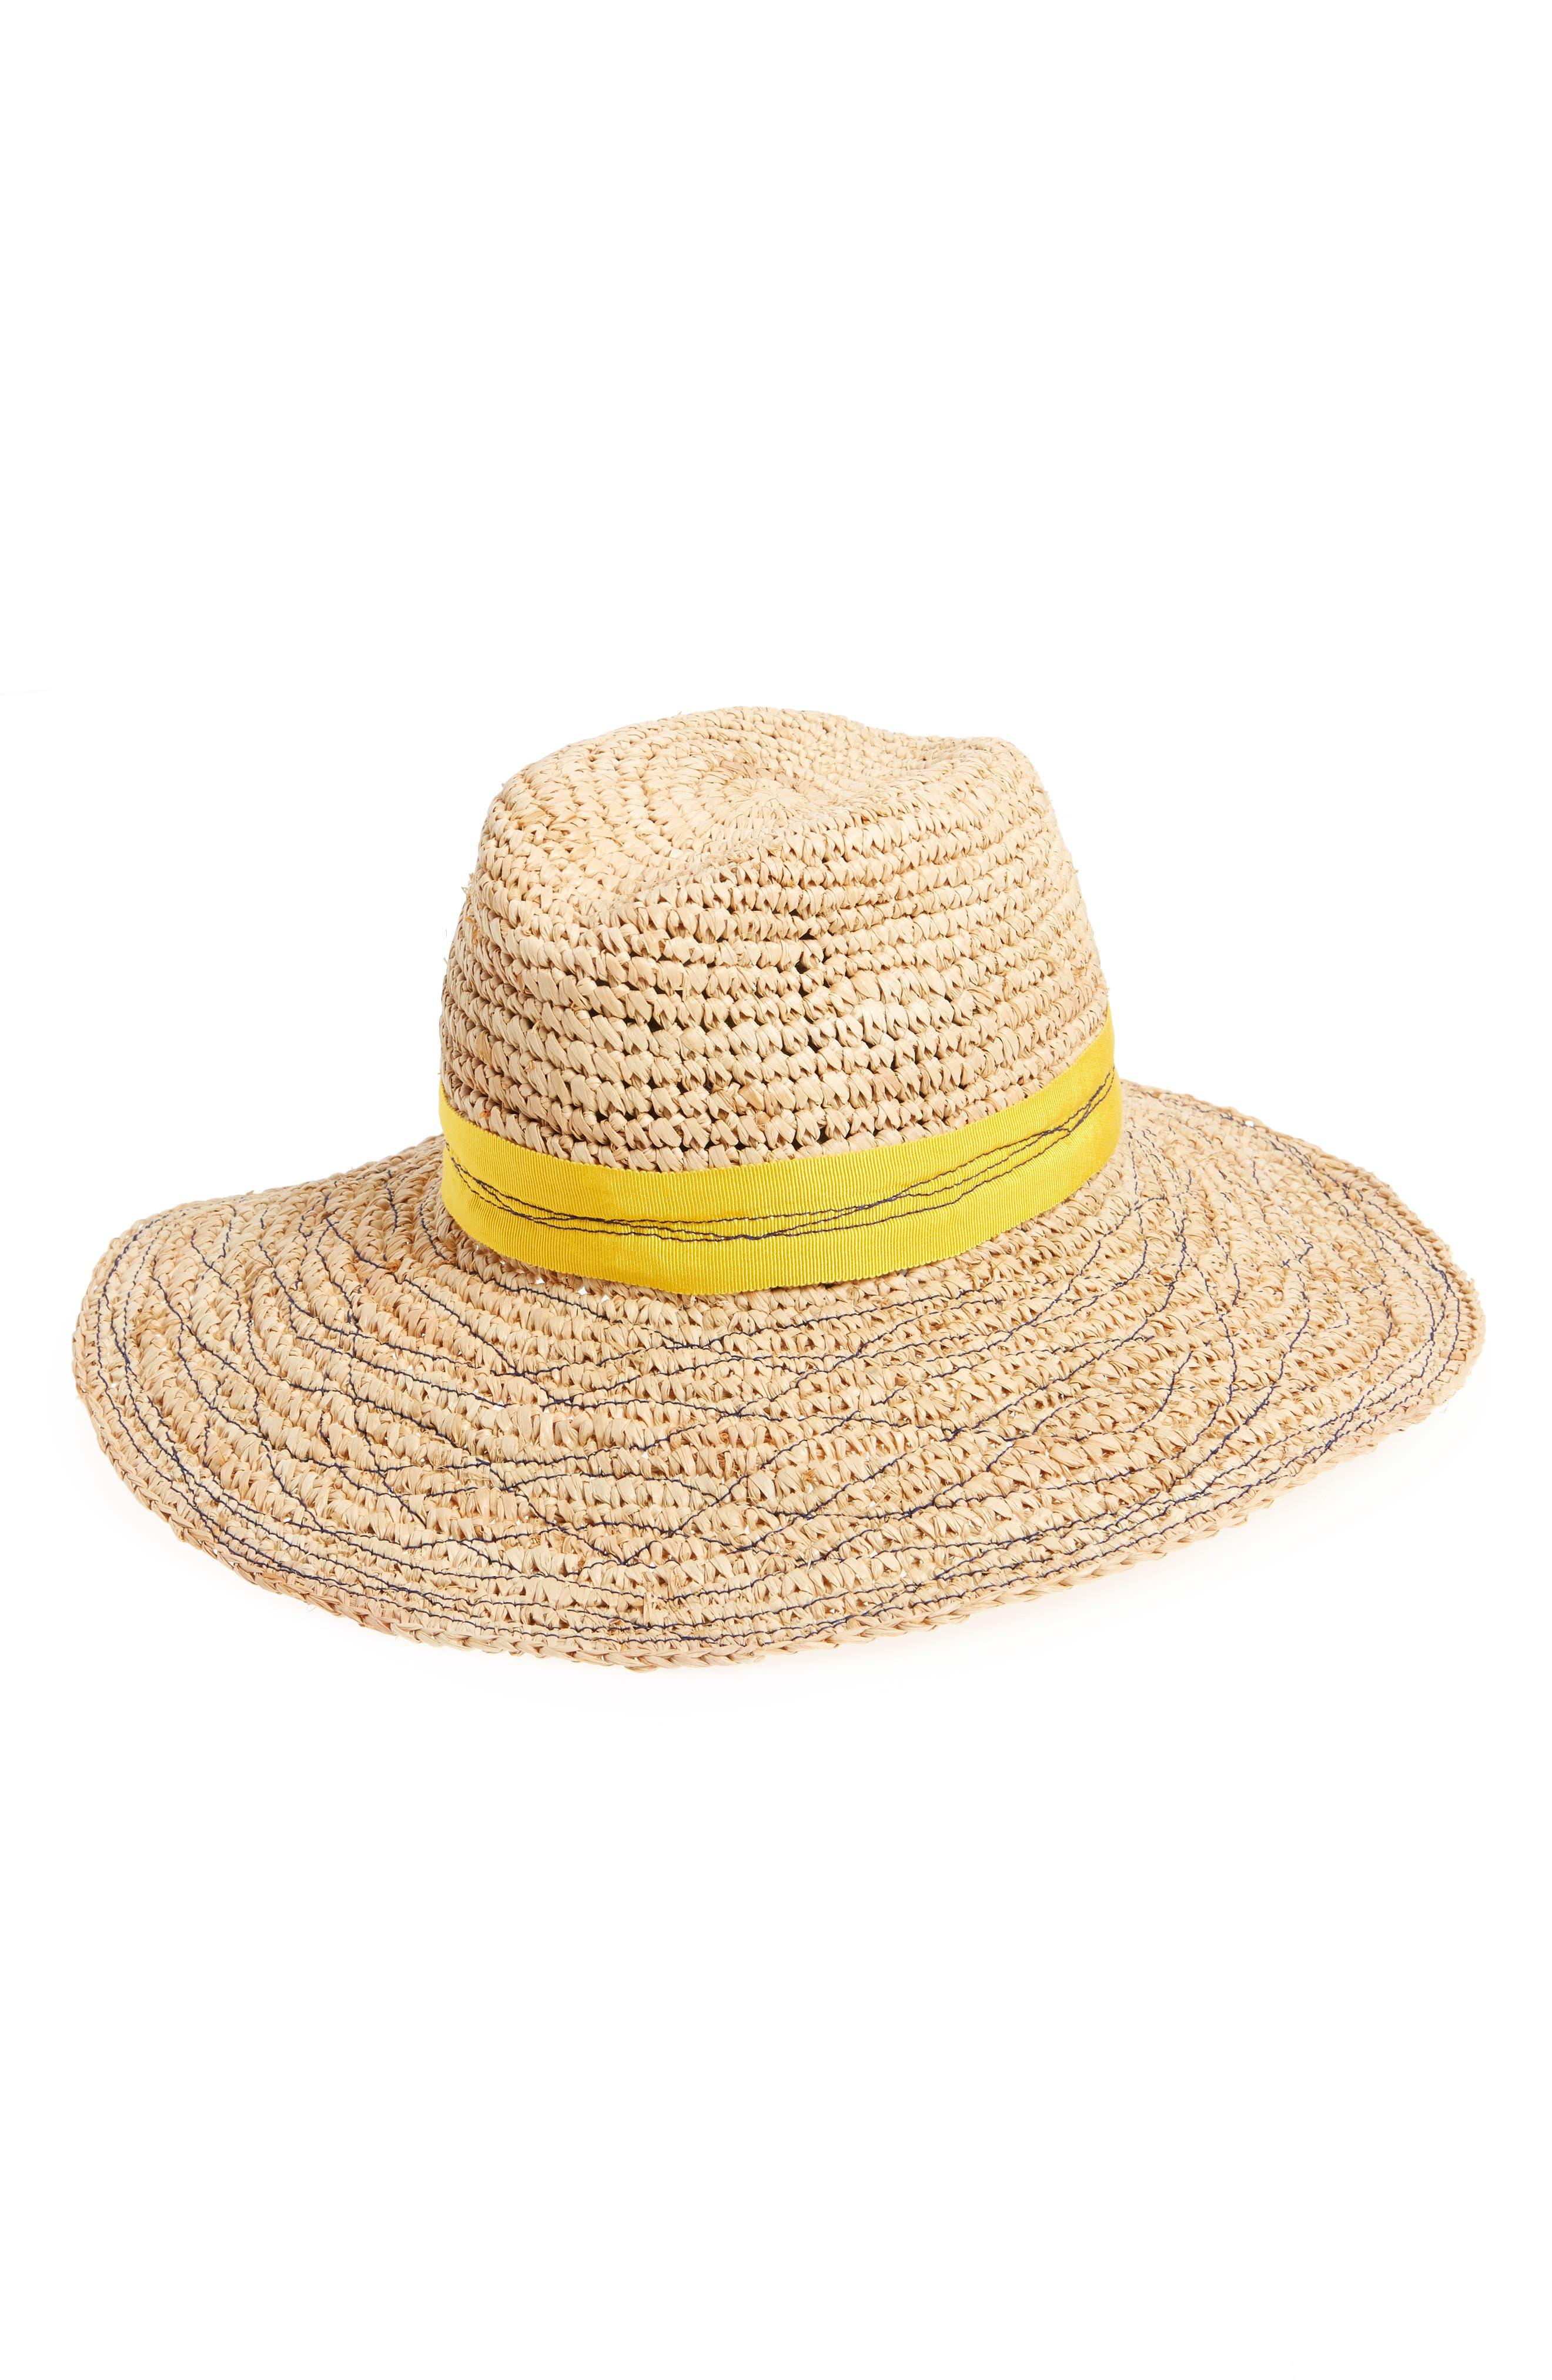 Re-Mama Tarboush Raffia Hat,                         Main,                         color, YELLOW